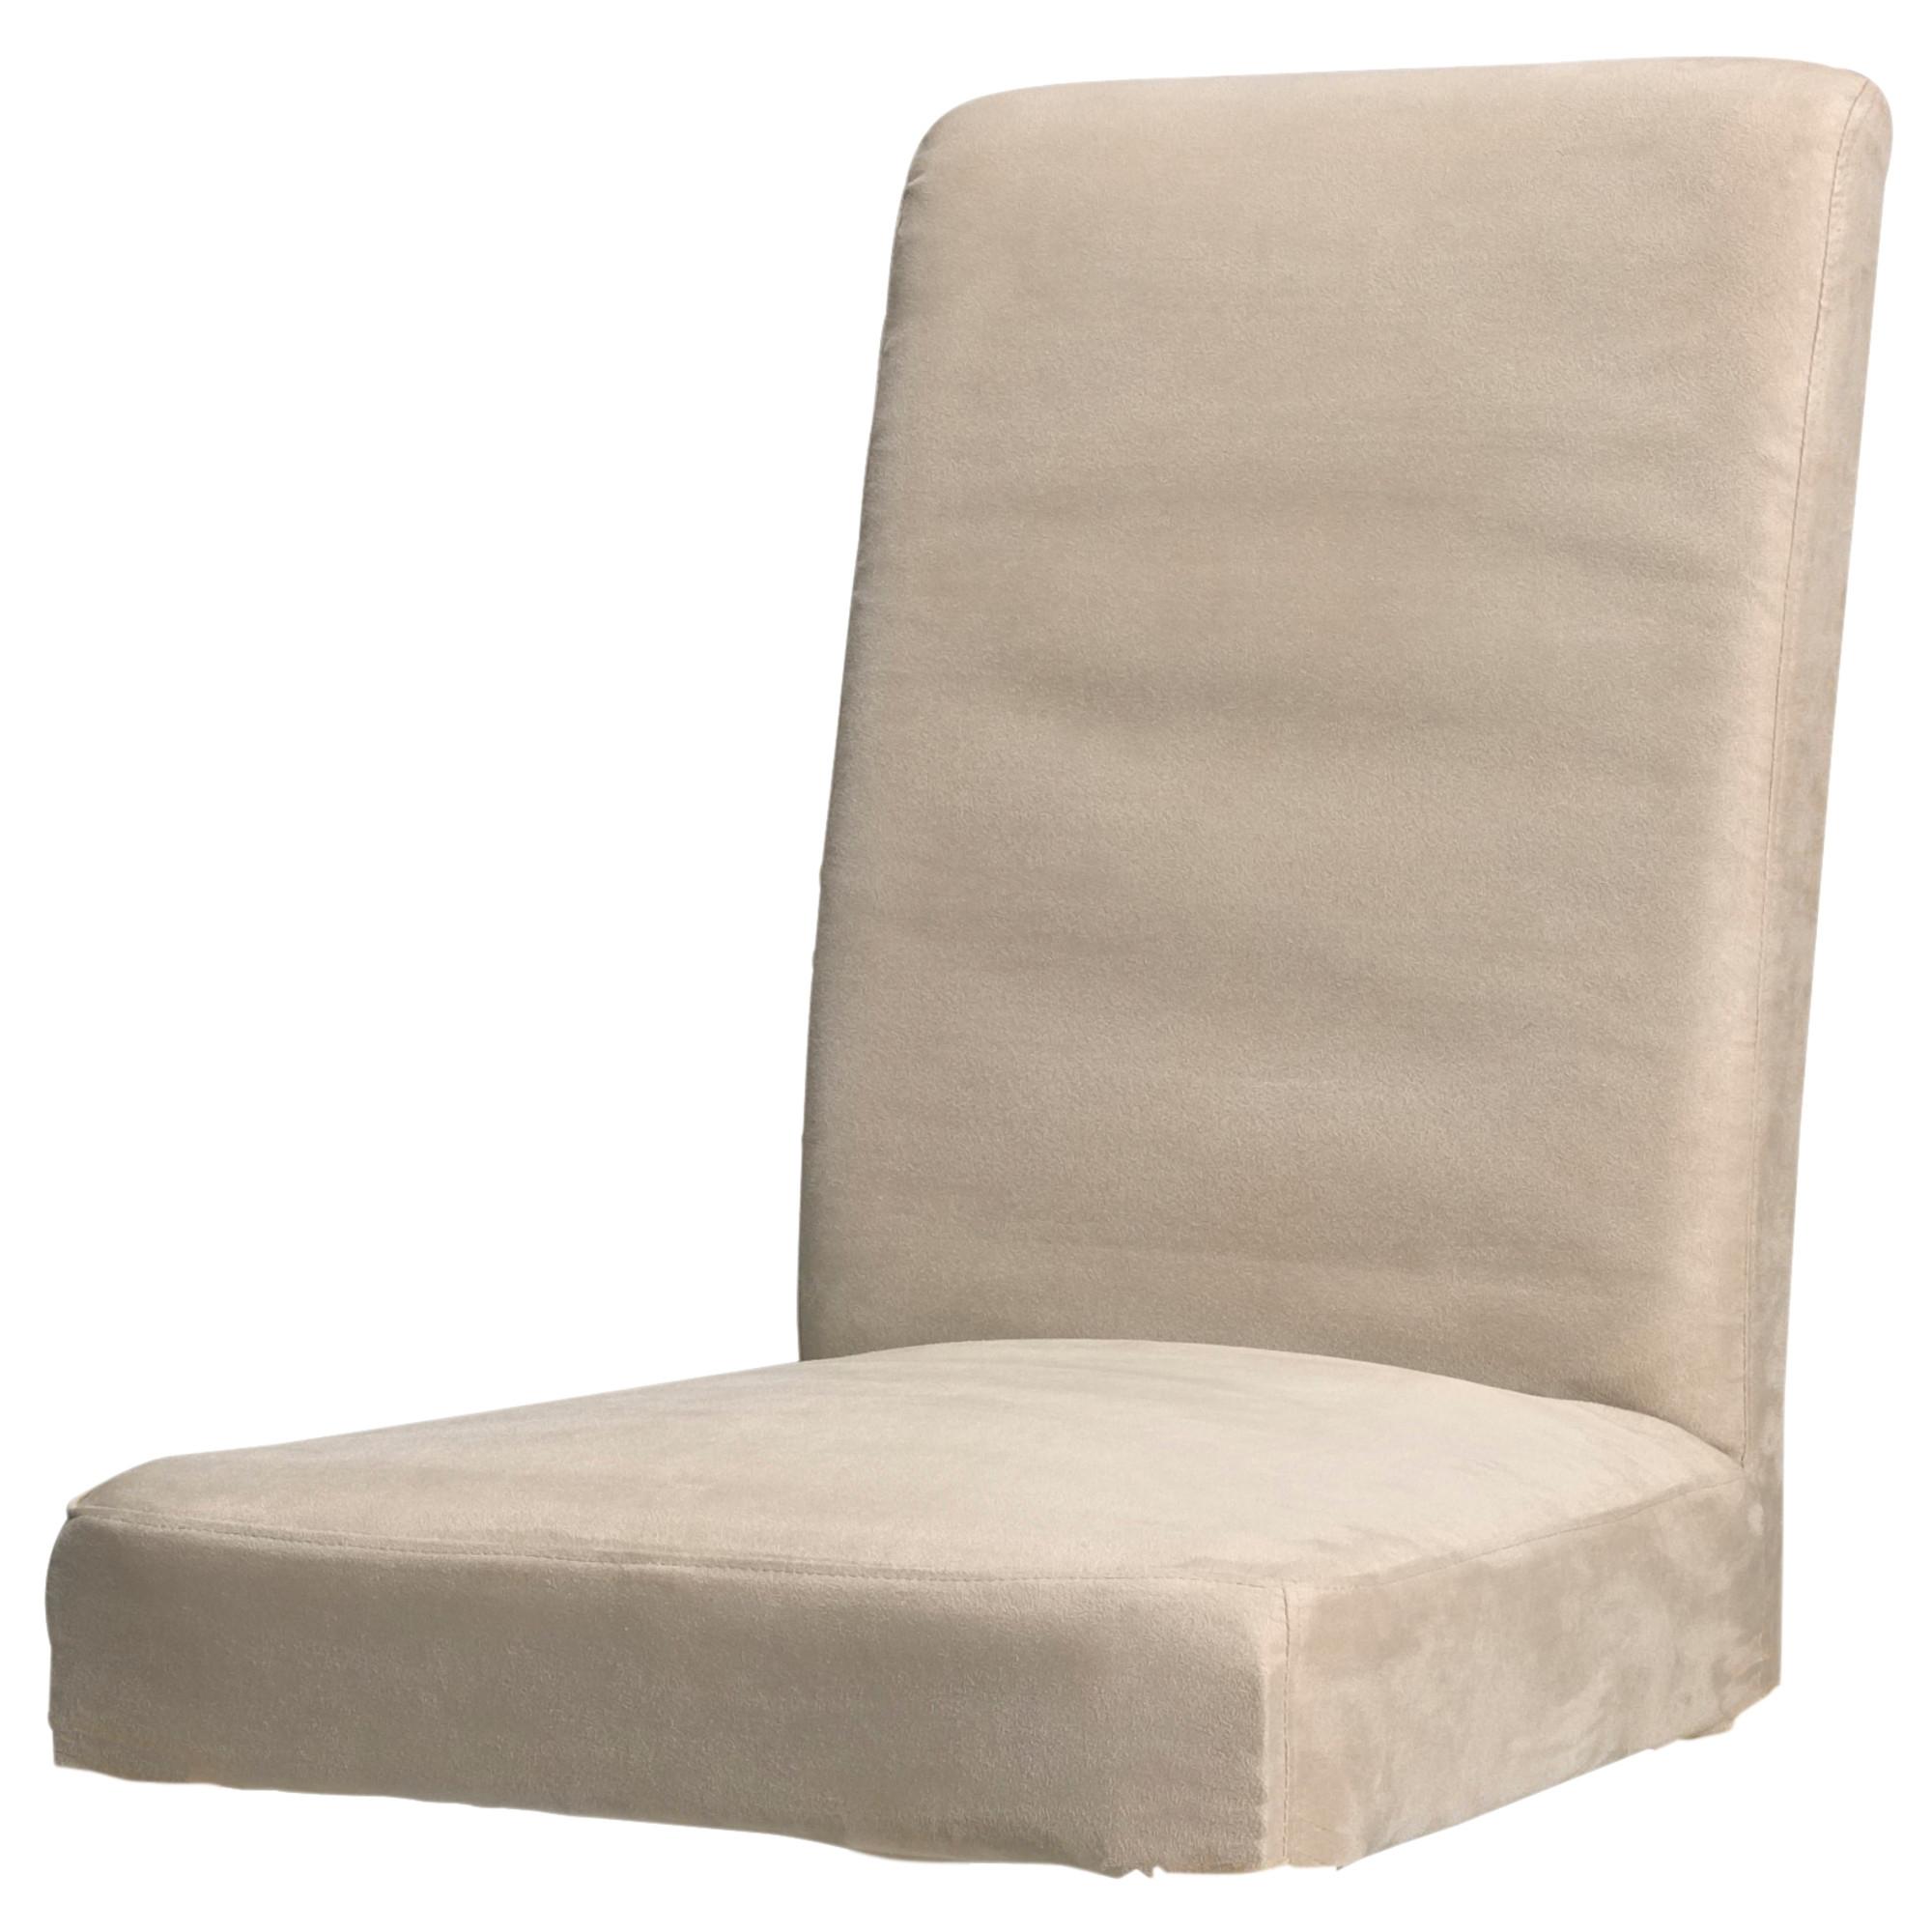 Dormitorio muebles modernos ikea tenerife productos - Ikea tenerife productos ...